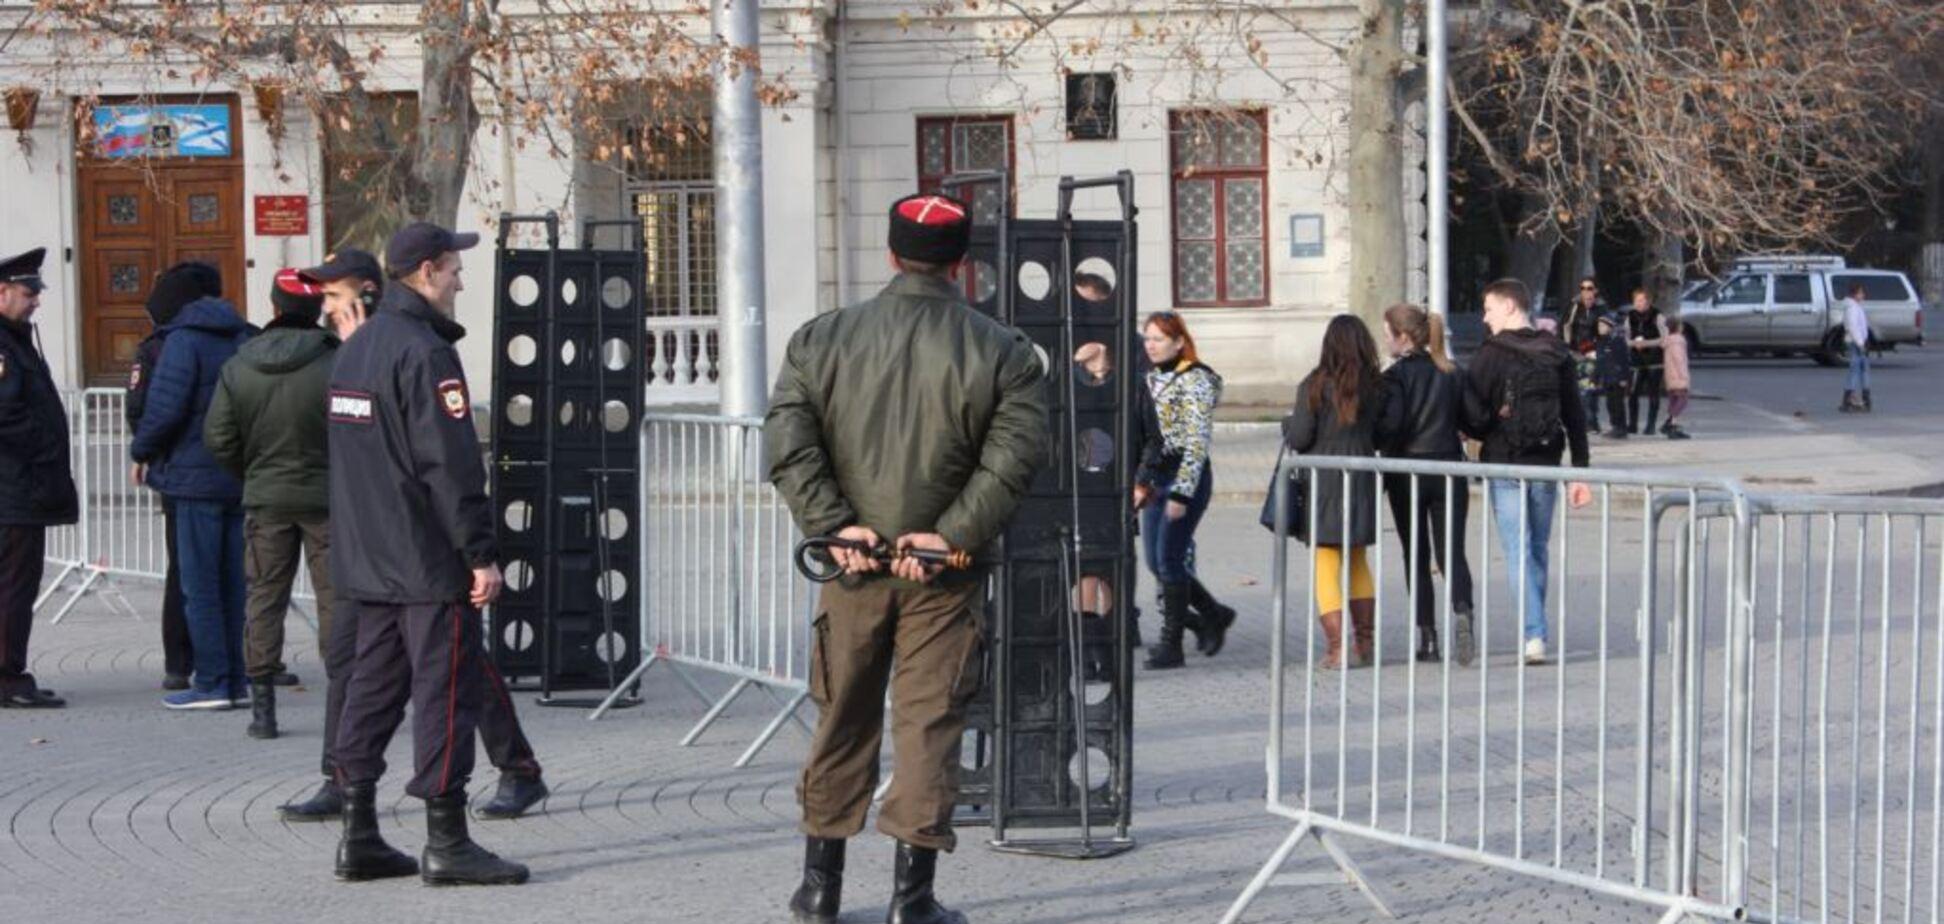 Елка в Севастополе: 'казаки' пропускают детей через металлодетектор